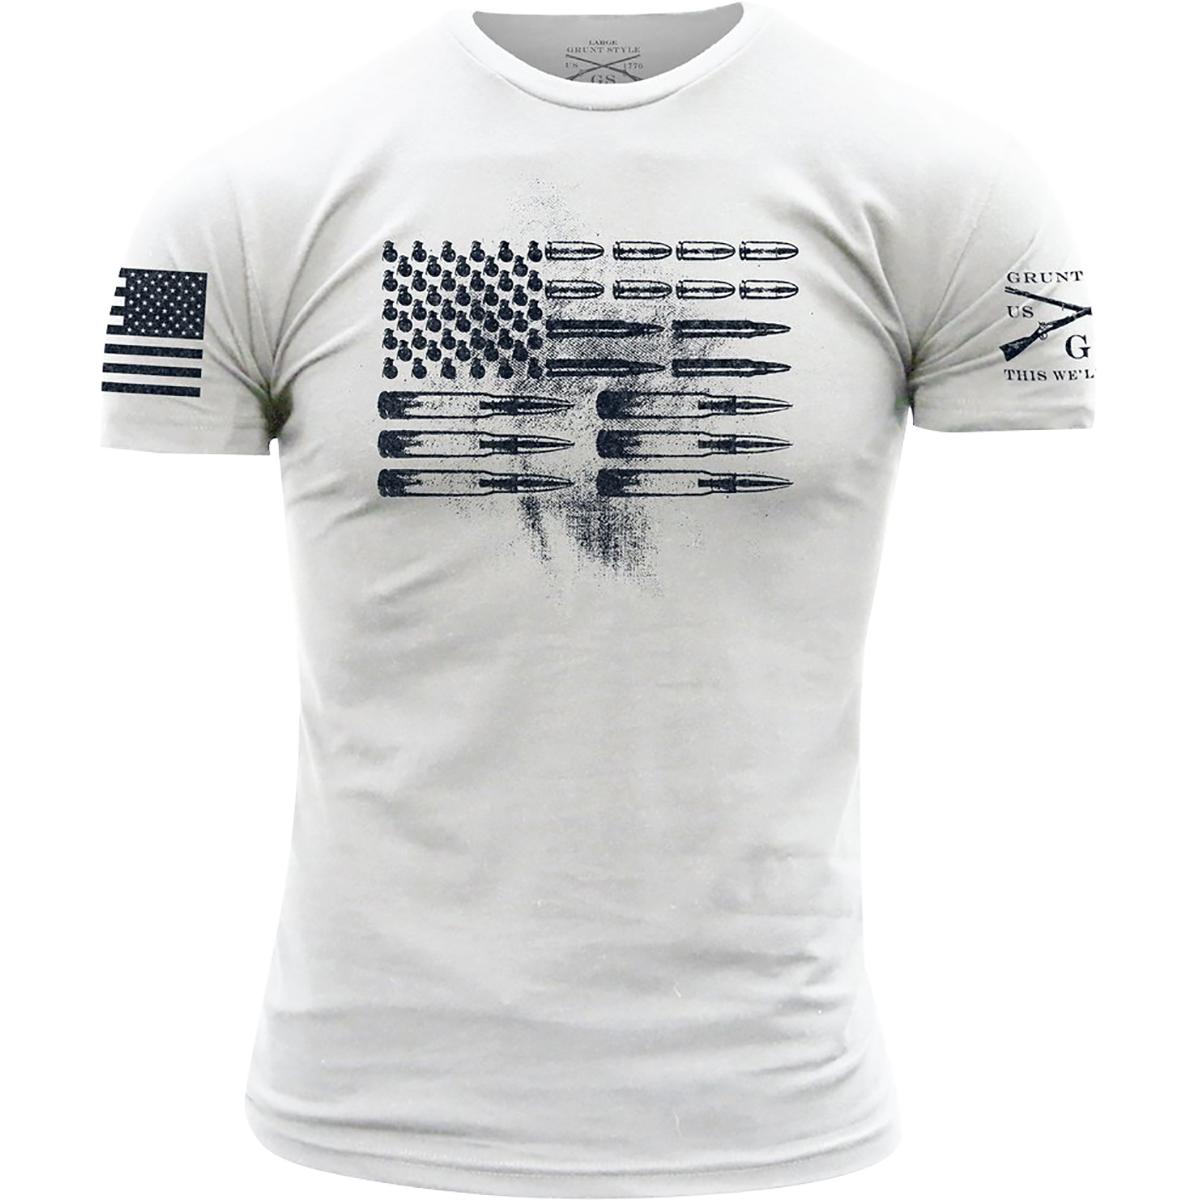 482d61264 Grunt Style Ammo Flag Crewneck T-Shirt - Small - White